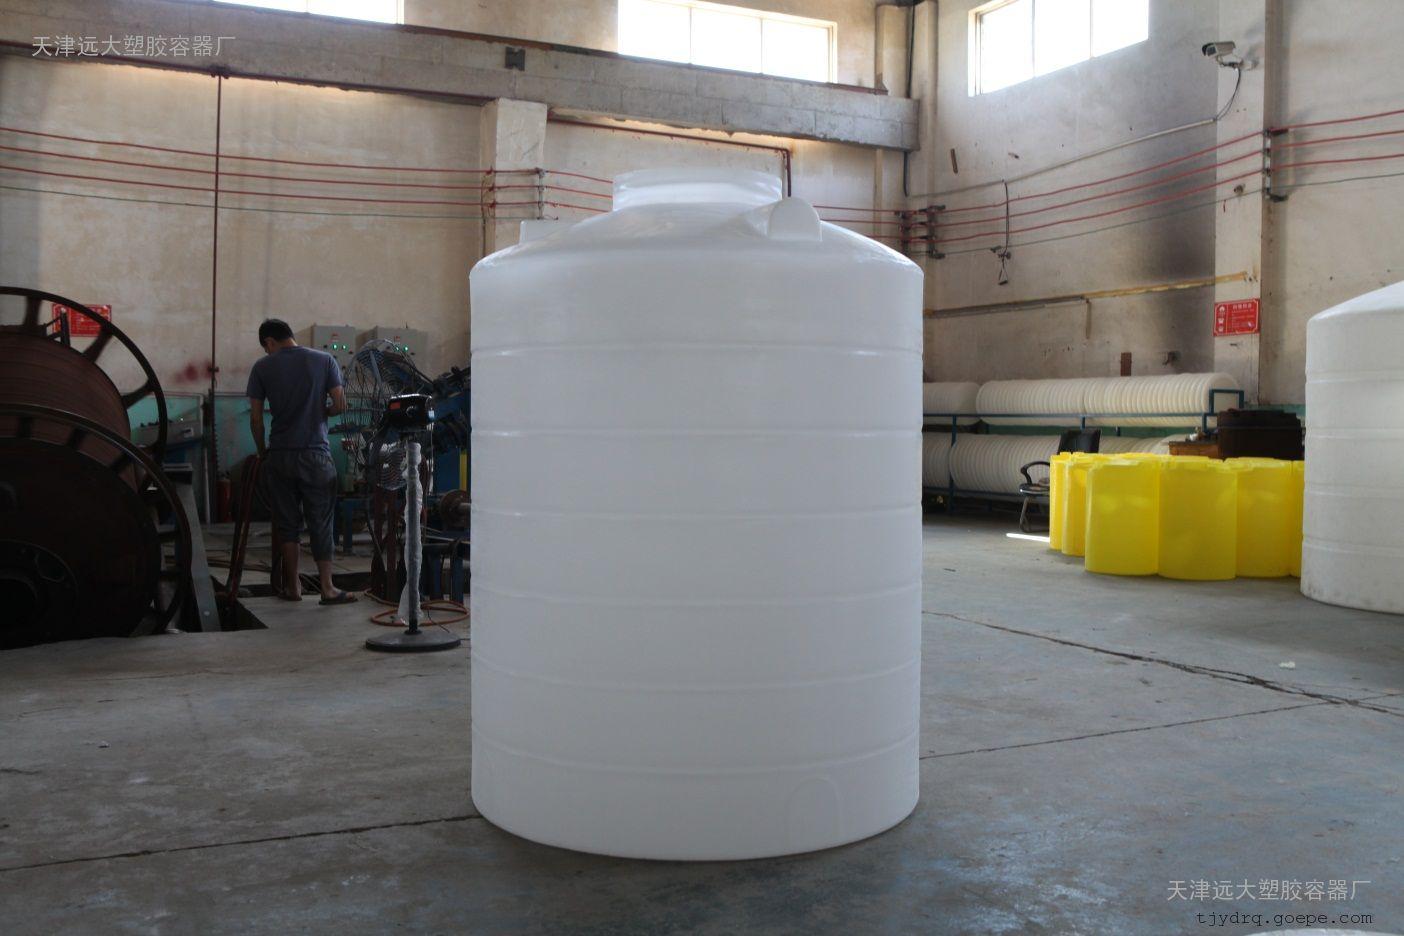 pe水箱 水处理pe水箱 滚塑一次成型pe水箱